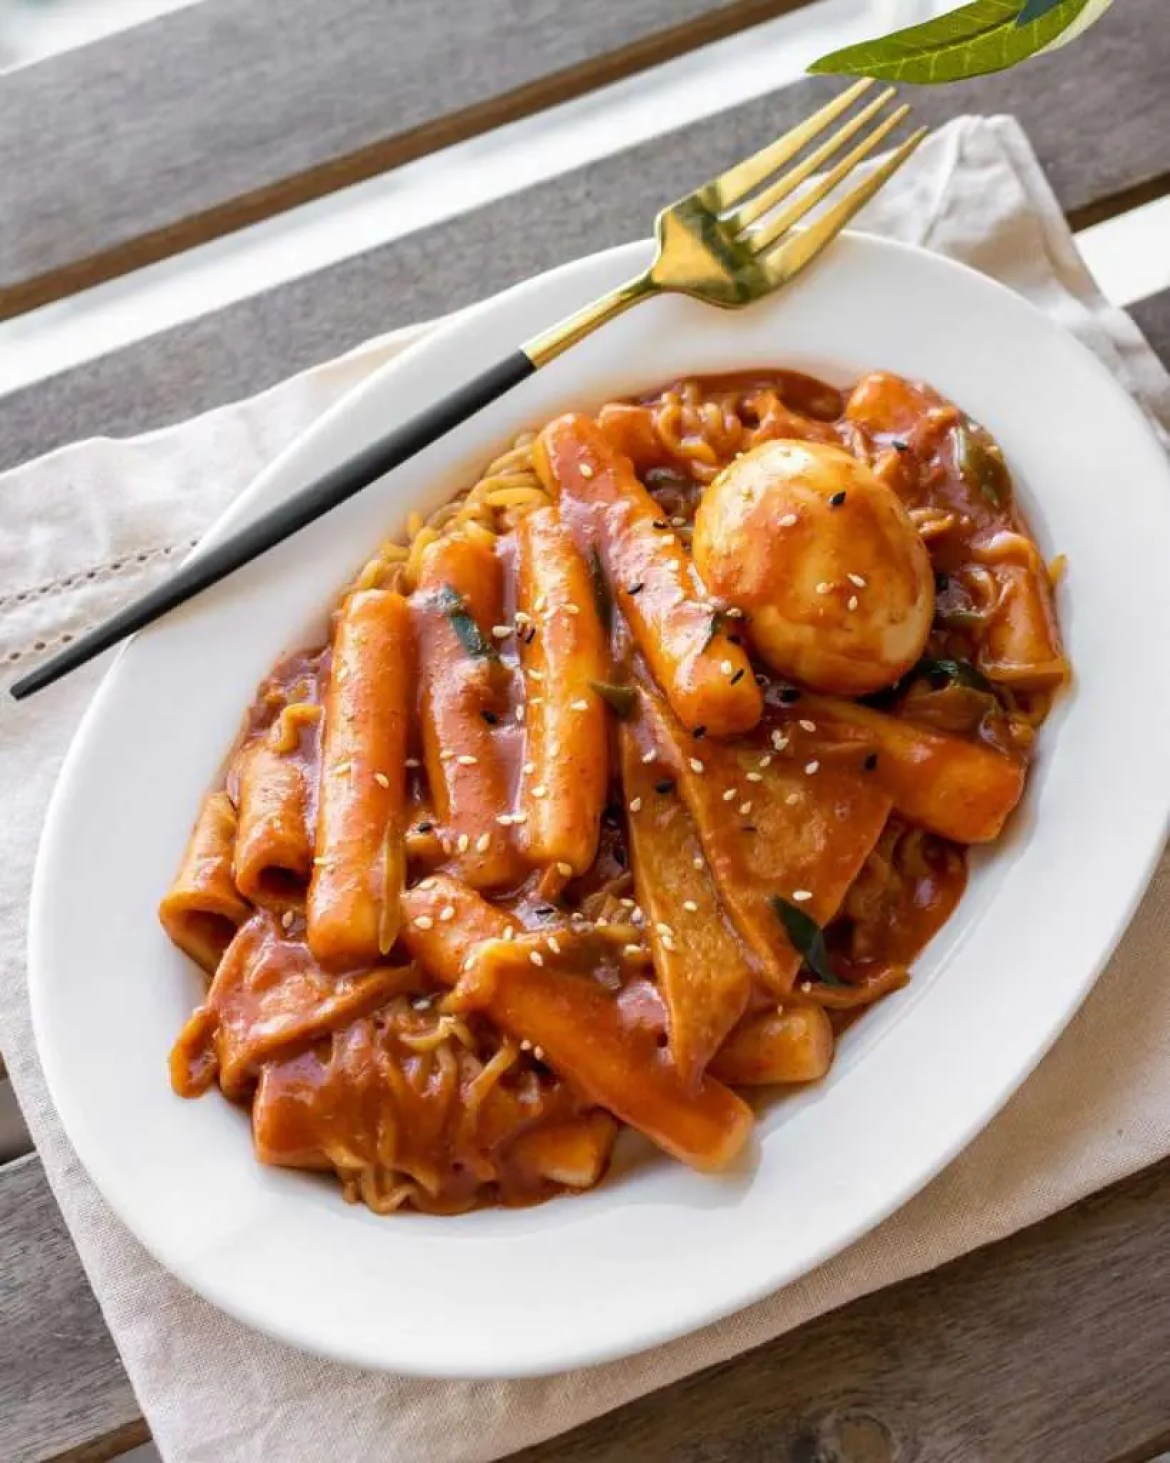 Tteokbokki (Spicy Rice Cakes)